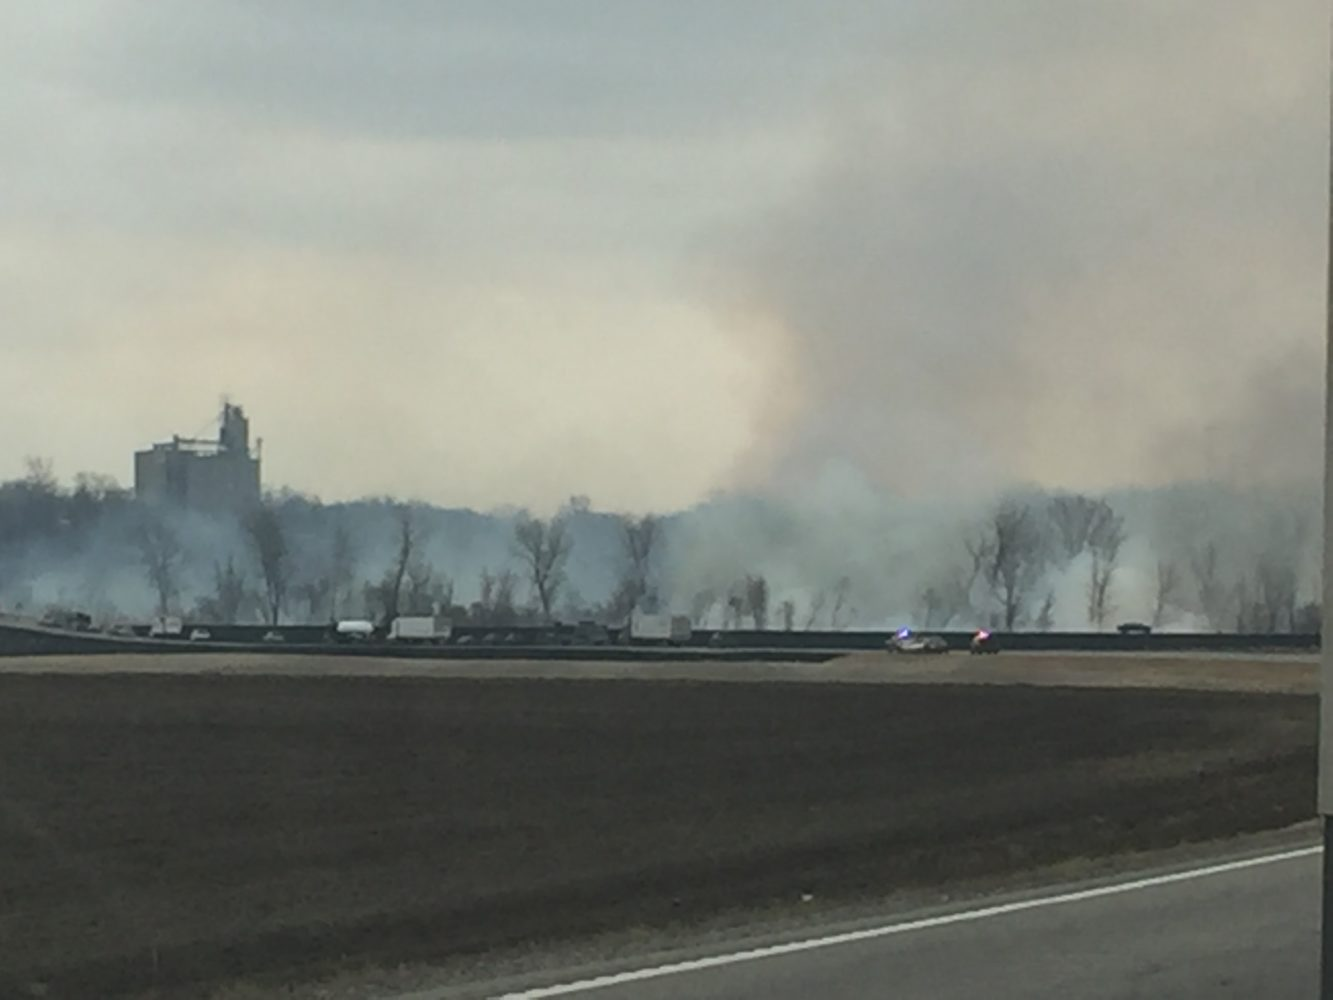 UPDATE: Carroll County crash disrupting traffic near Missouri River Bridge on Highway 41